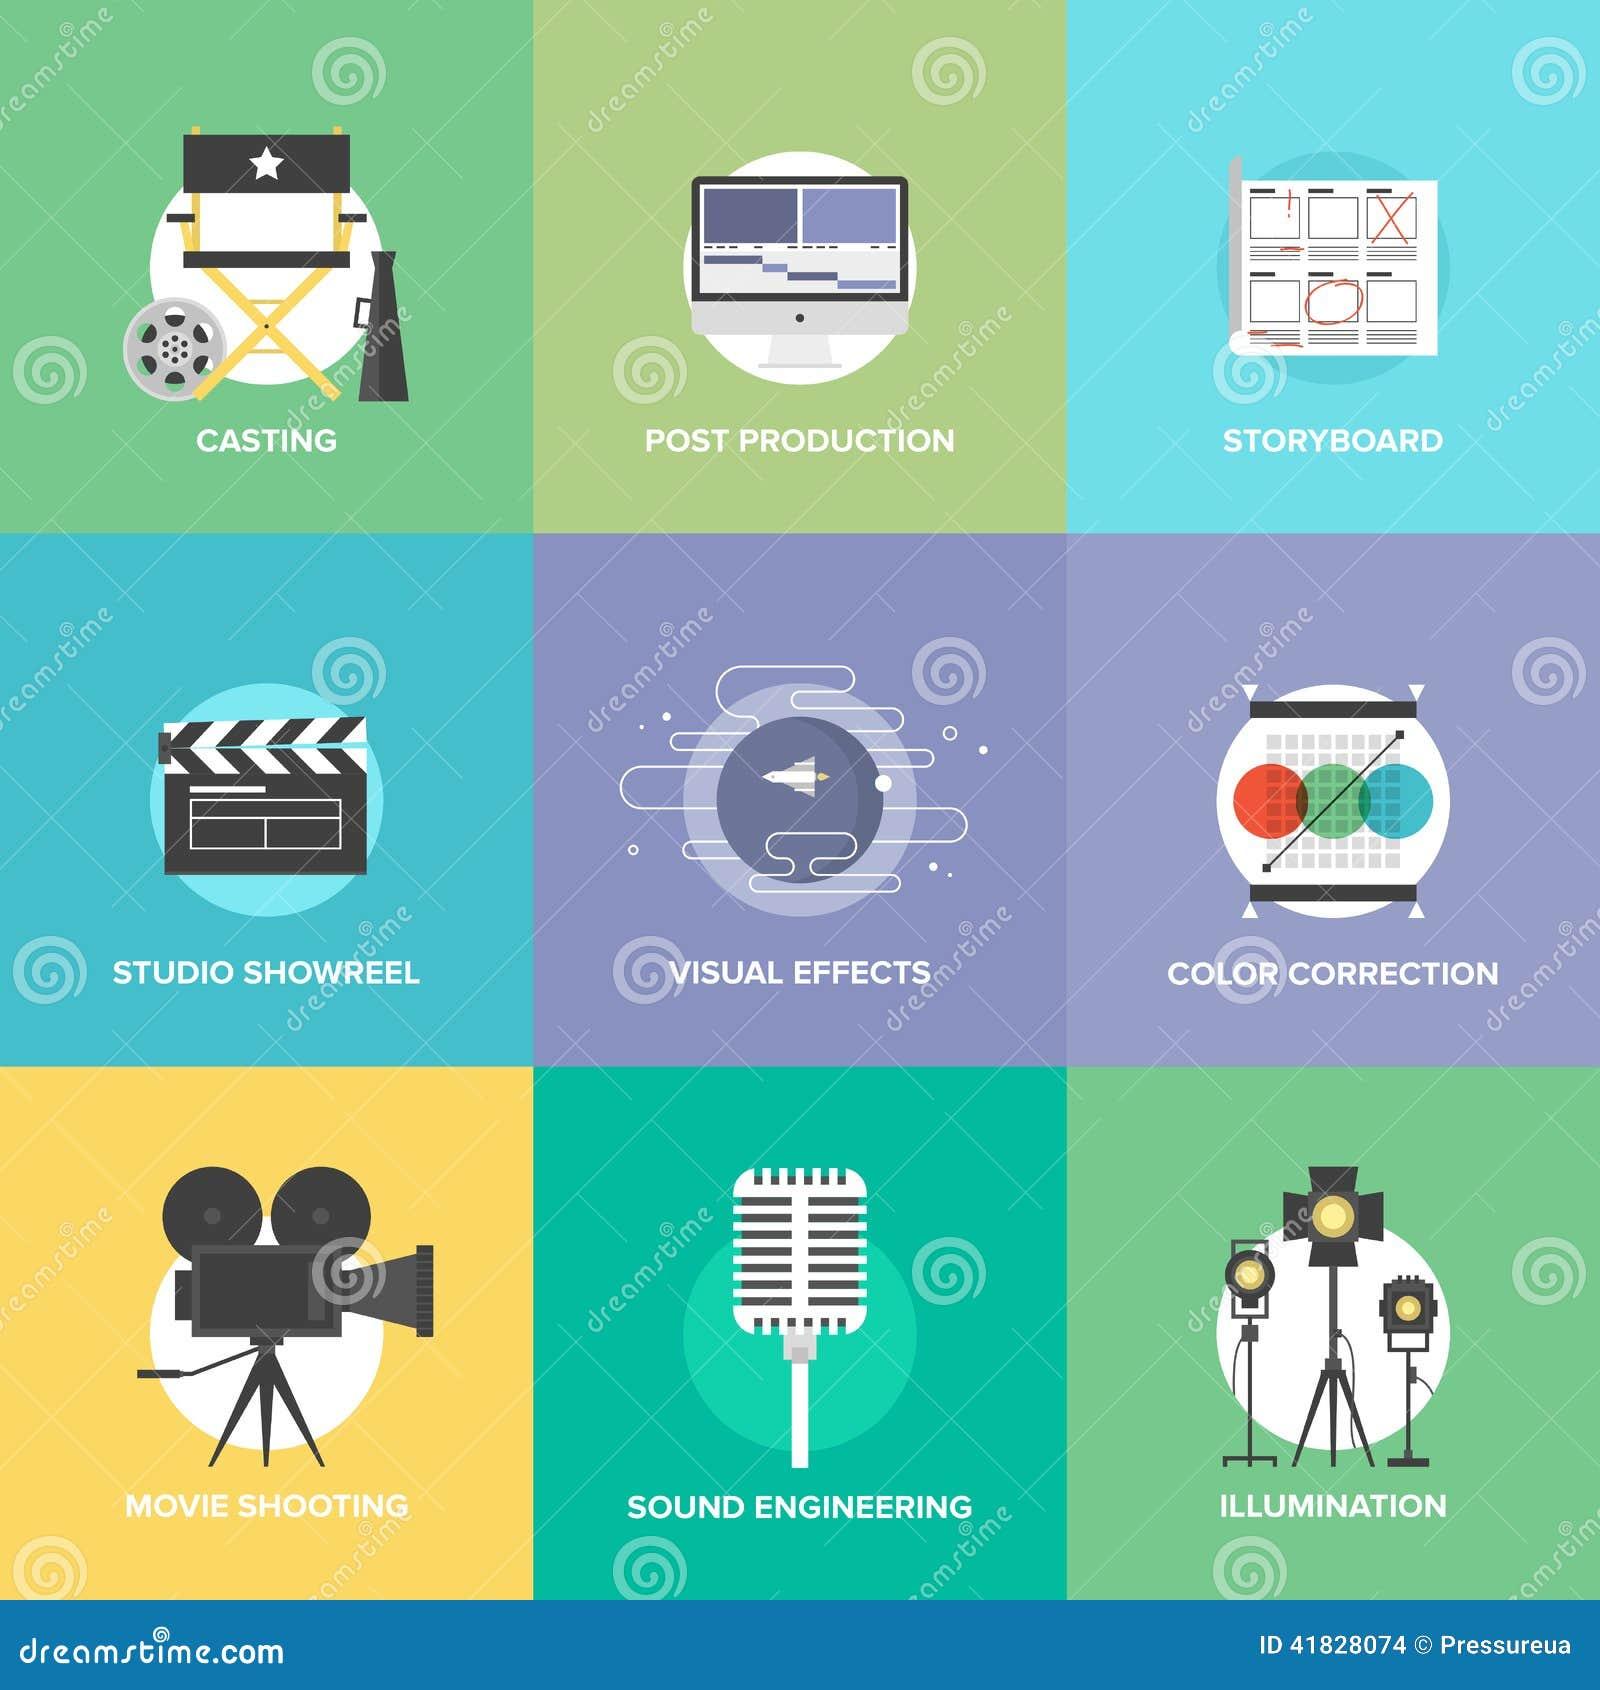 , movie shooting, studio showreel, actors casting, storyboard writing ...